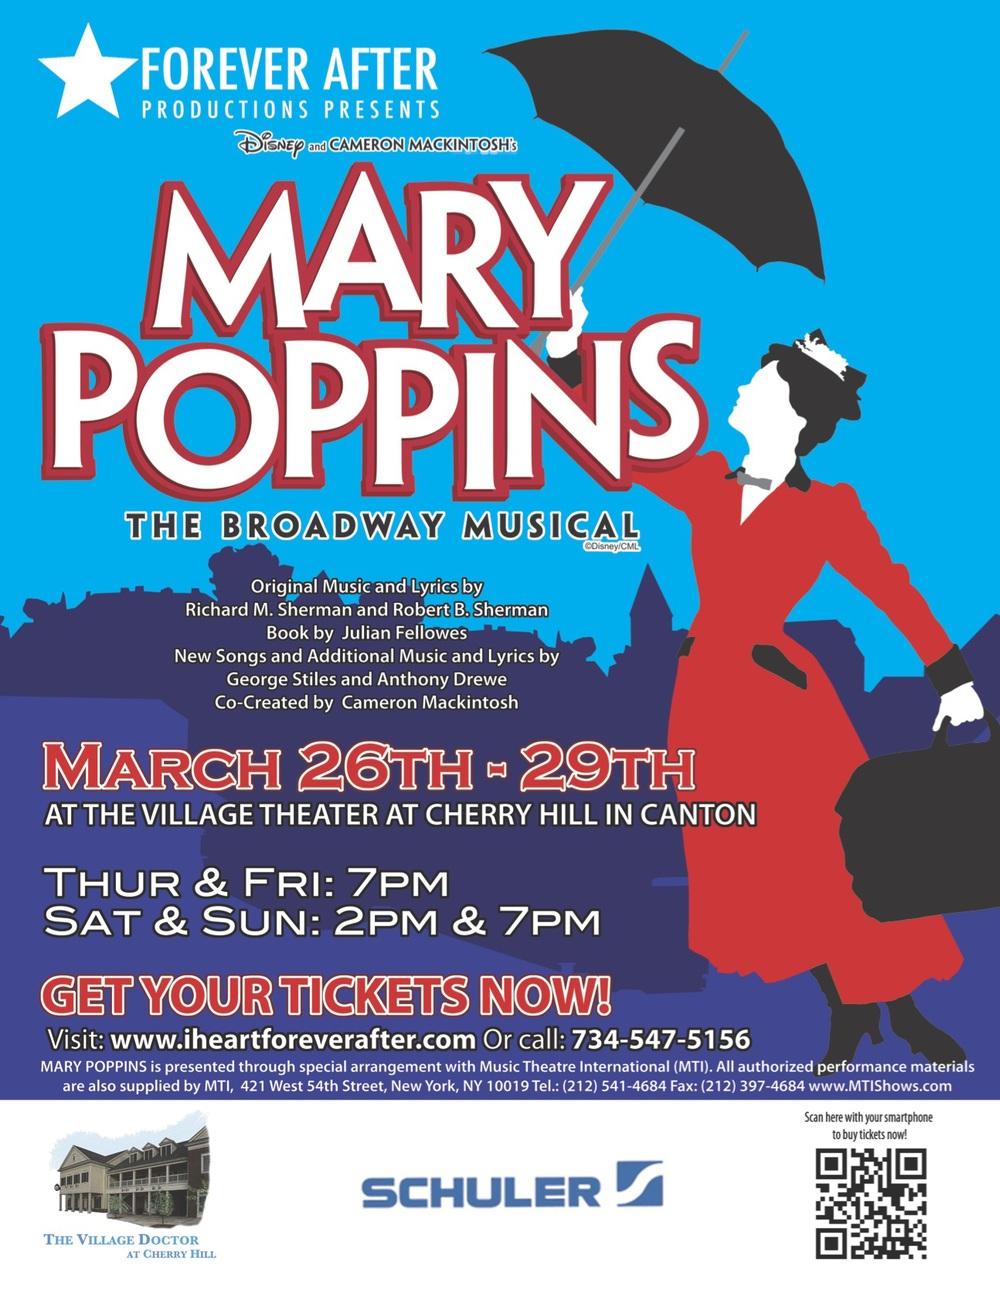 Poppins Poster 8.5x11-2.jpg